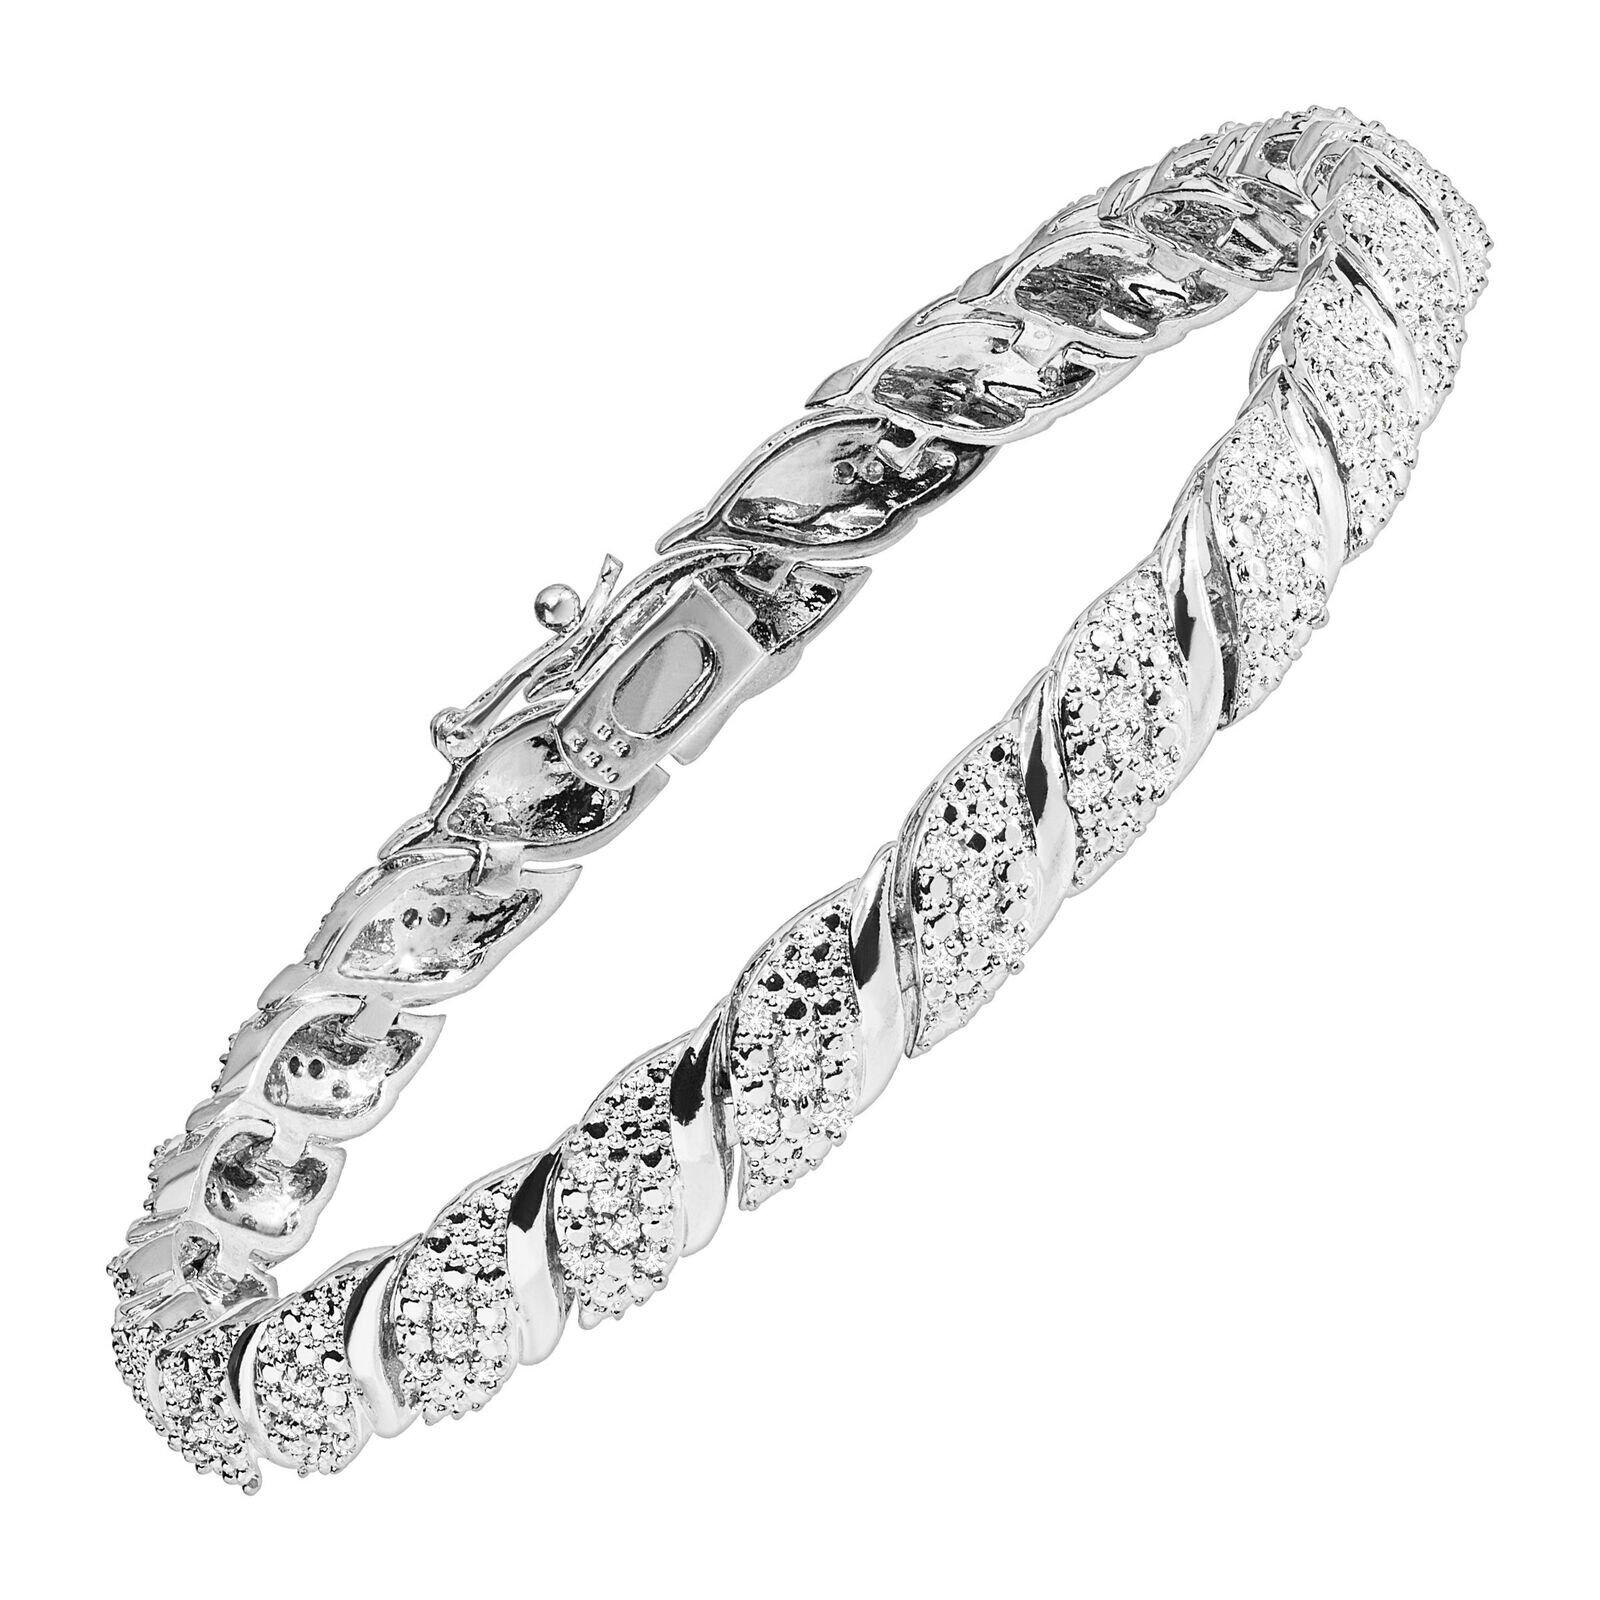 "1 CT Diamond Tennis Bracelet (Sterling Silver Plated Brass, 7.5"")   Reg Price: $429   Today's Price: $124 (71% off!)    via eBay"